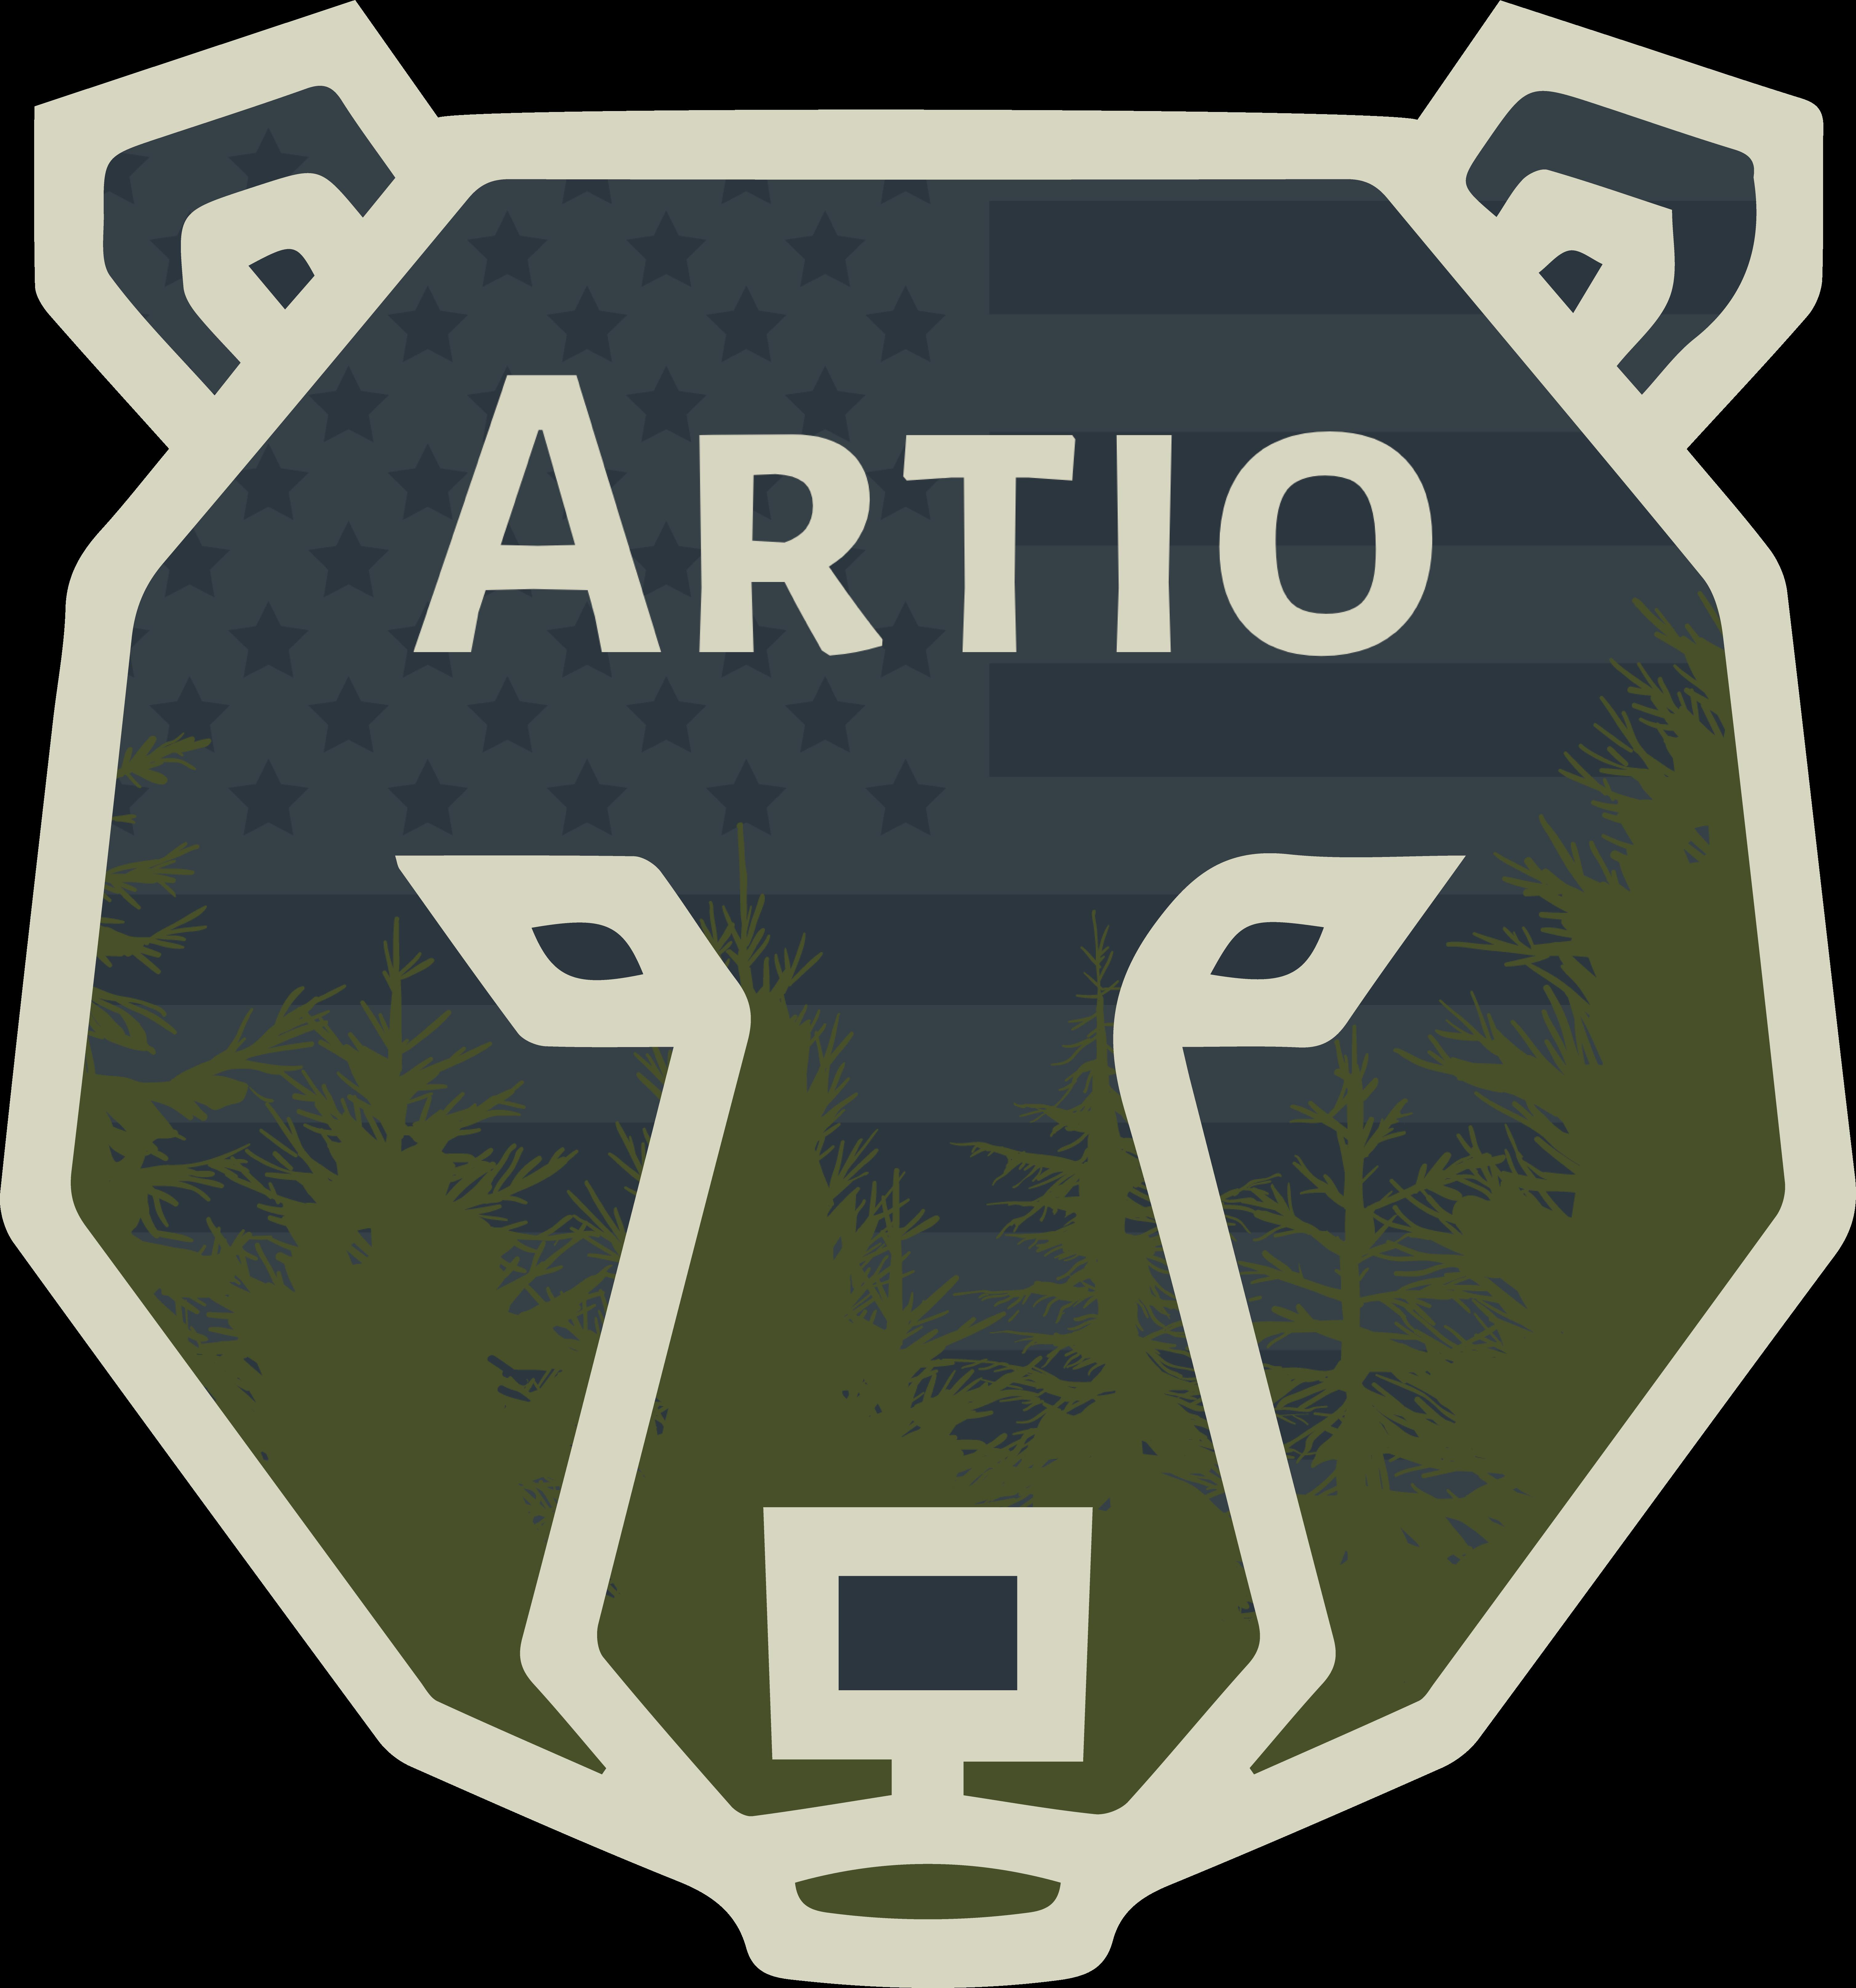 Artio Overland